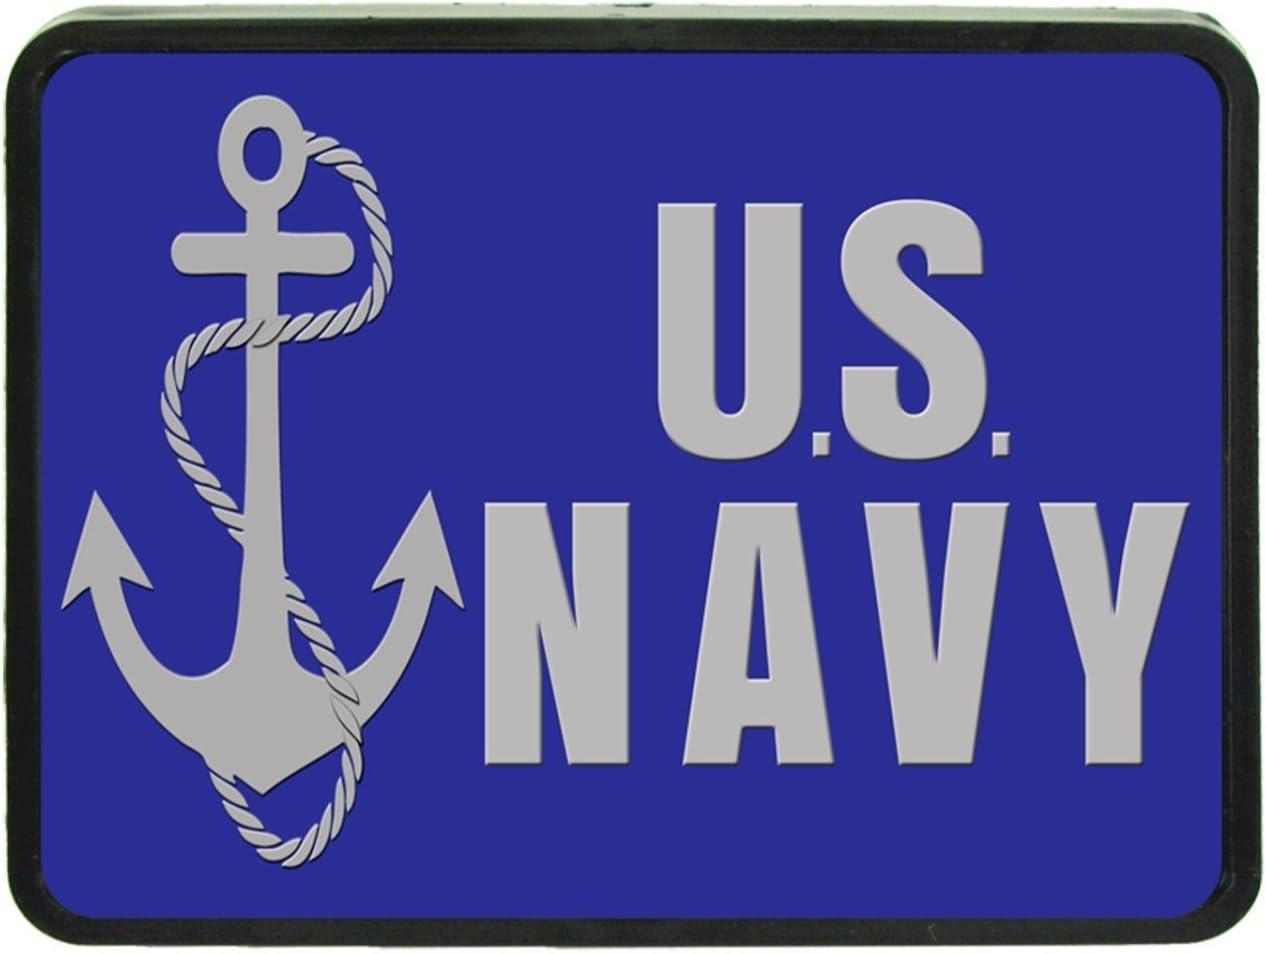 US Navy Custom Hitch Plug for 1 1//4 receiver from Redeye Laserworks